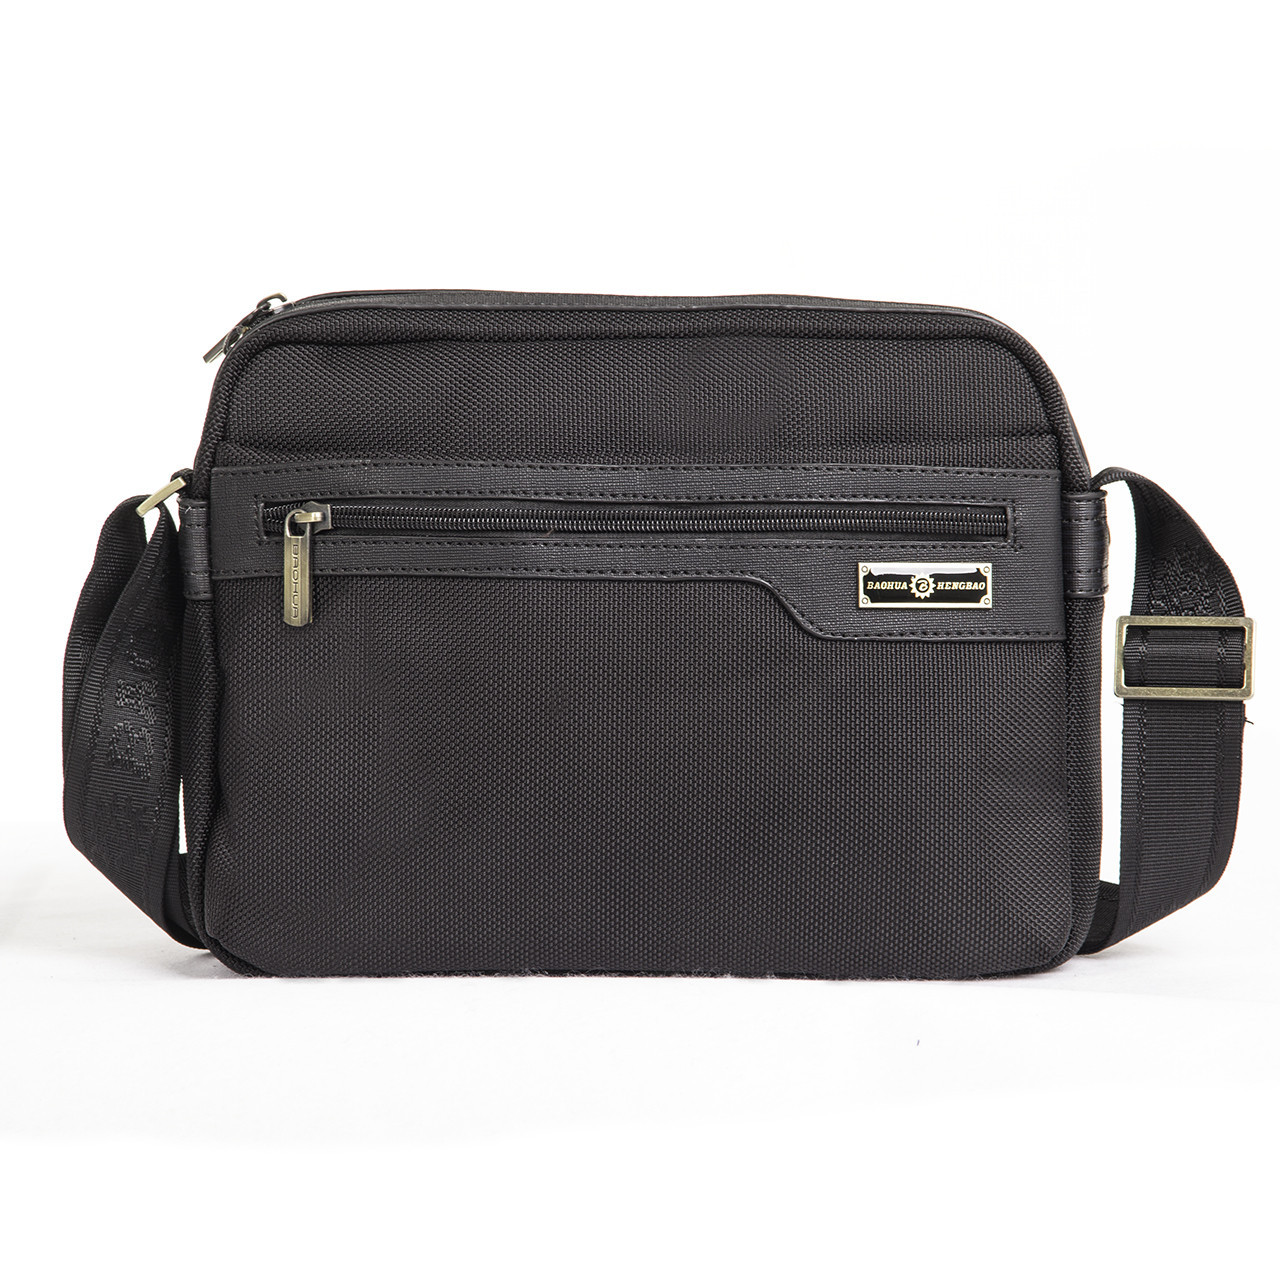 Мужская сумка BAOHUA Черная (ксВН8159-11)